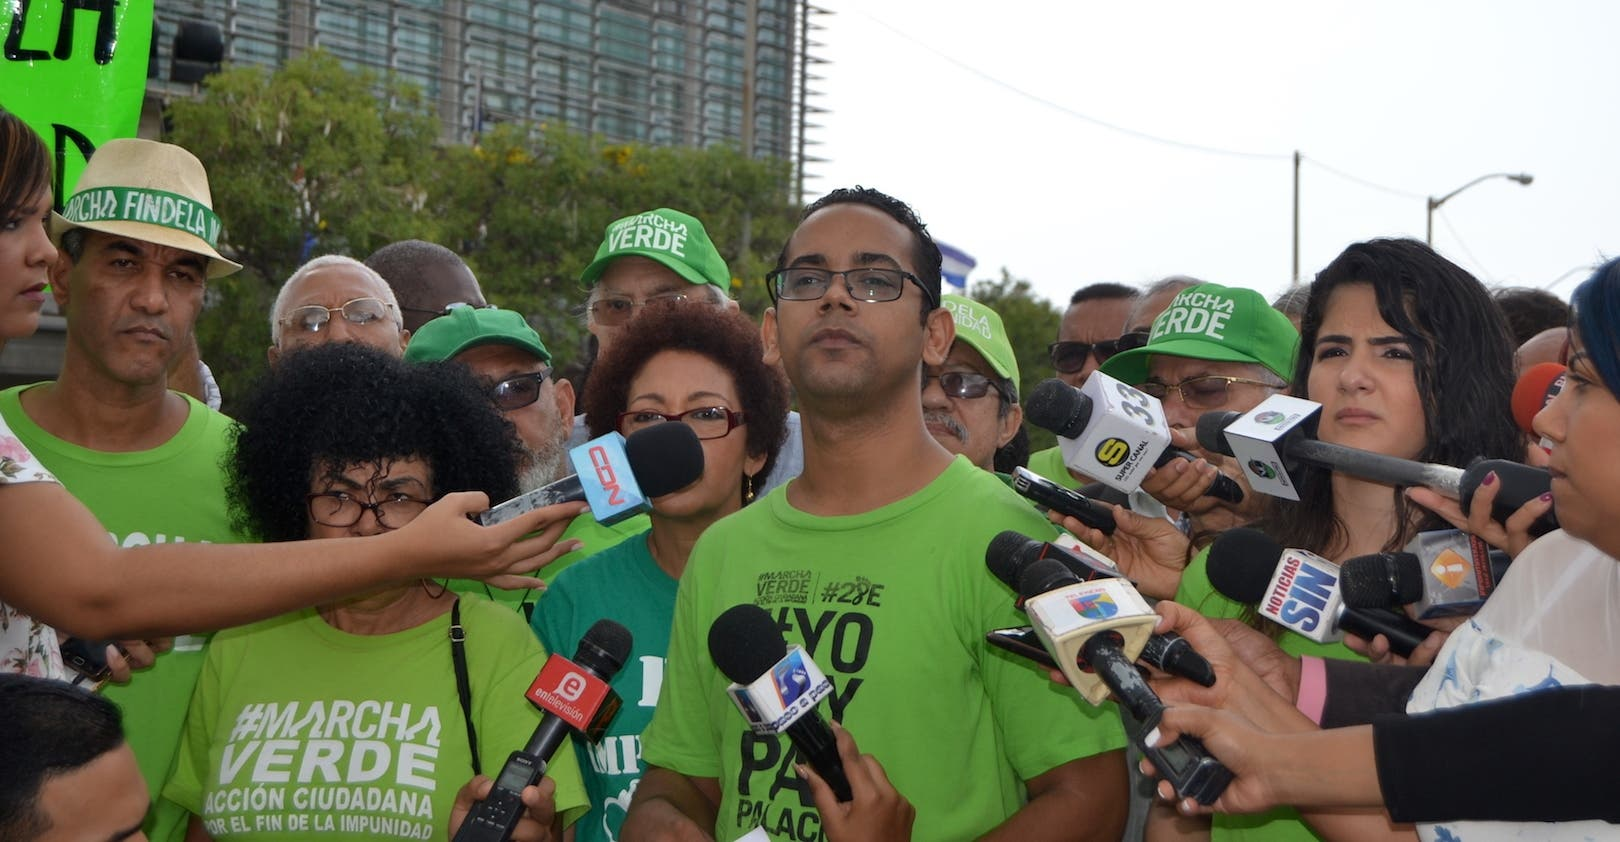 Jhonatan Liriano habla durante la rueda de prensa  de la Marcha Verde.